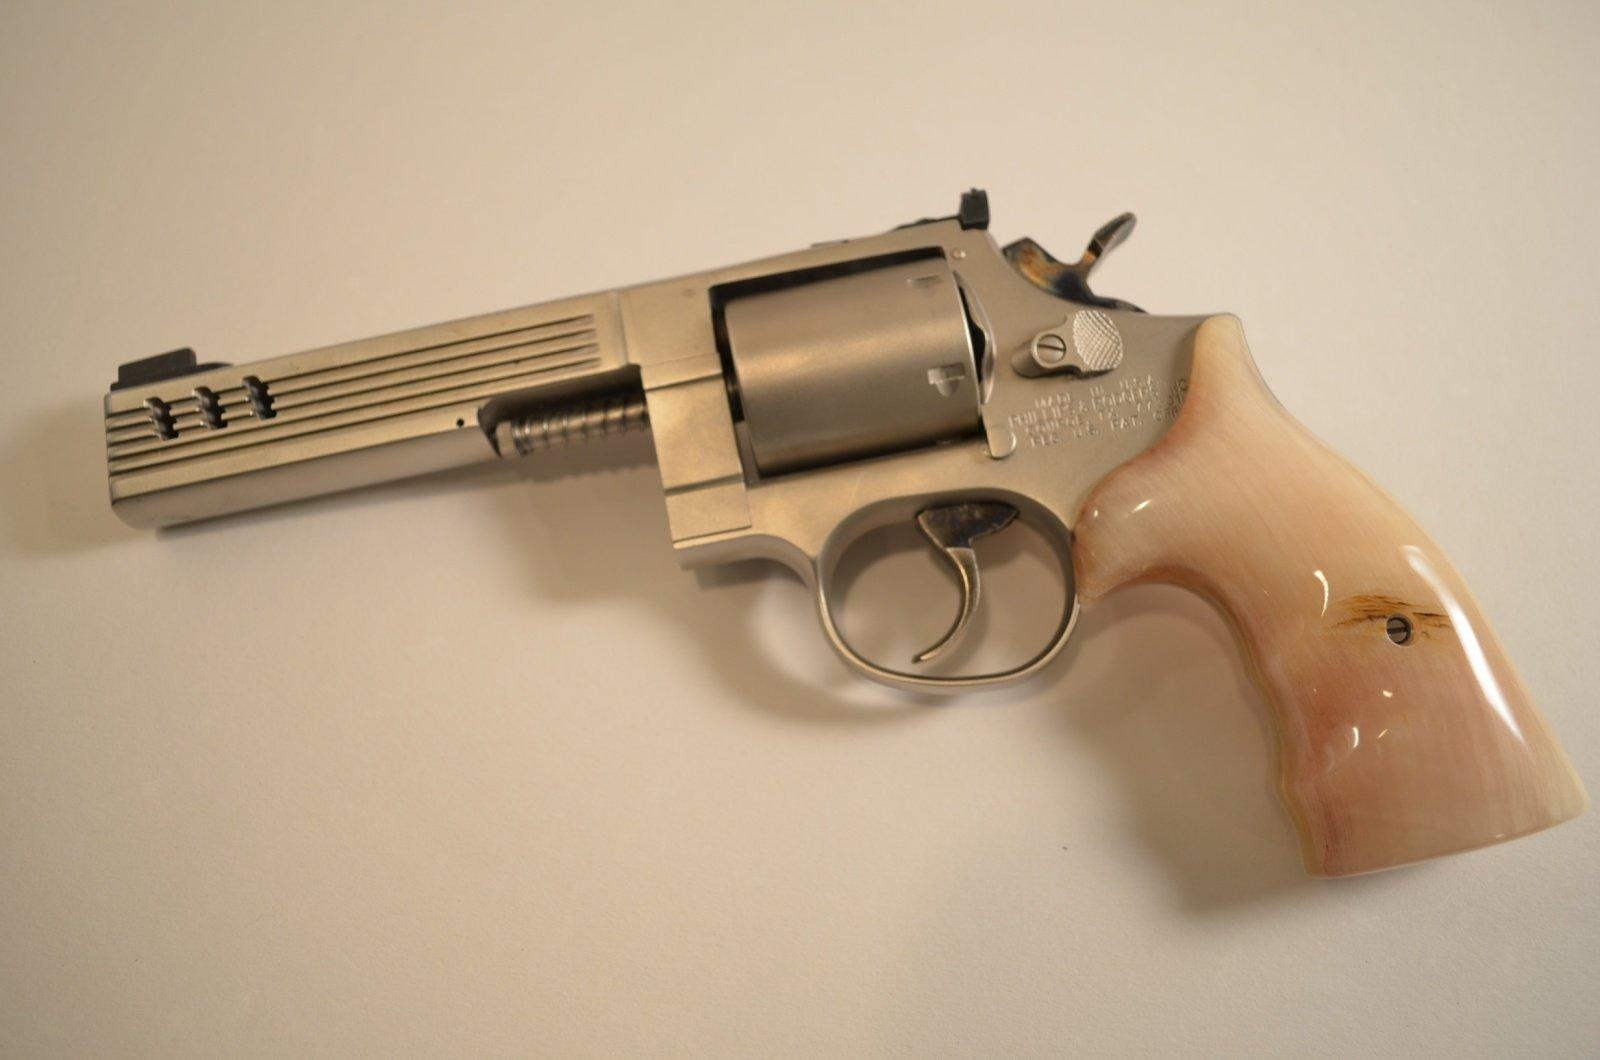 Medusa Model 47 Revolver Do Ktereho Nabijete Skoro Vsechno